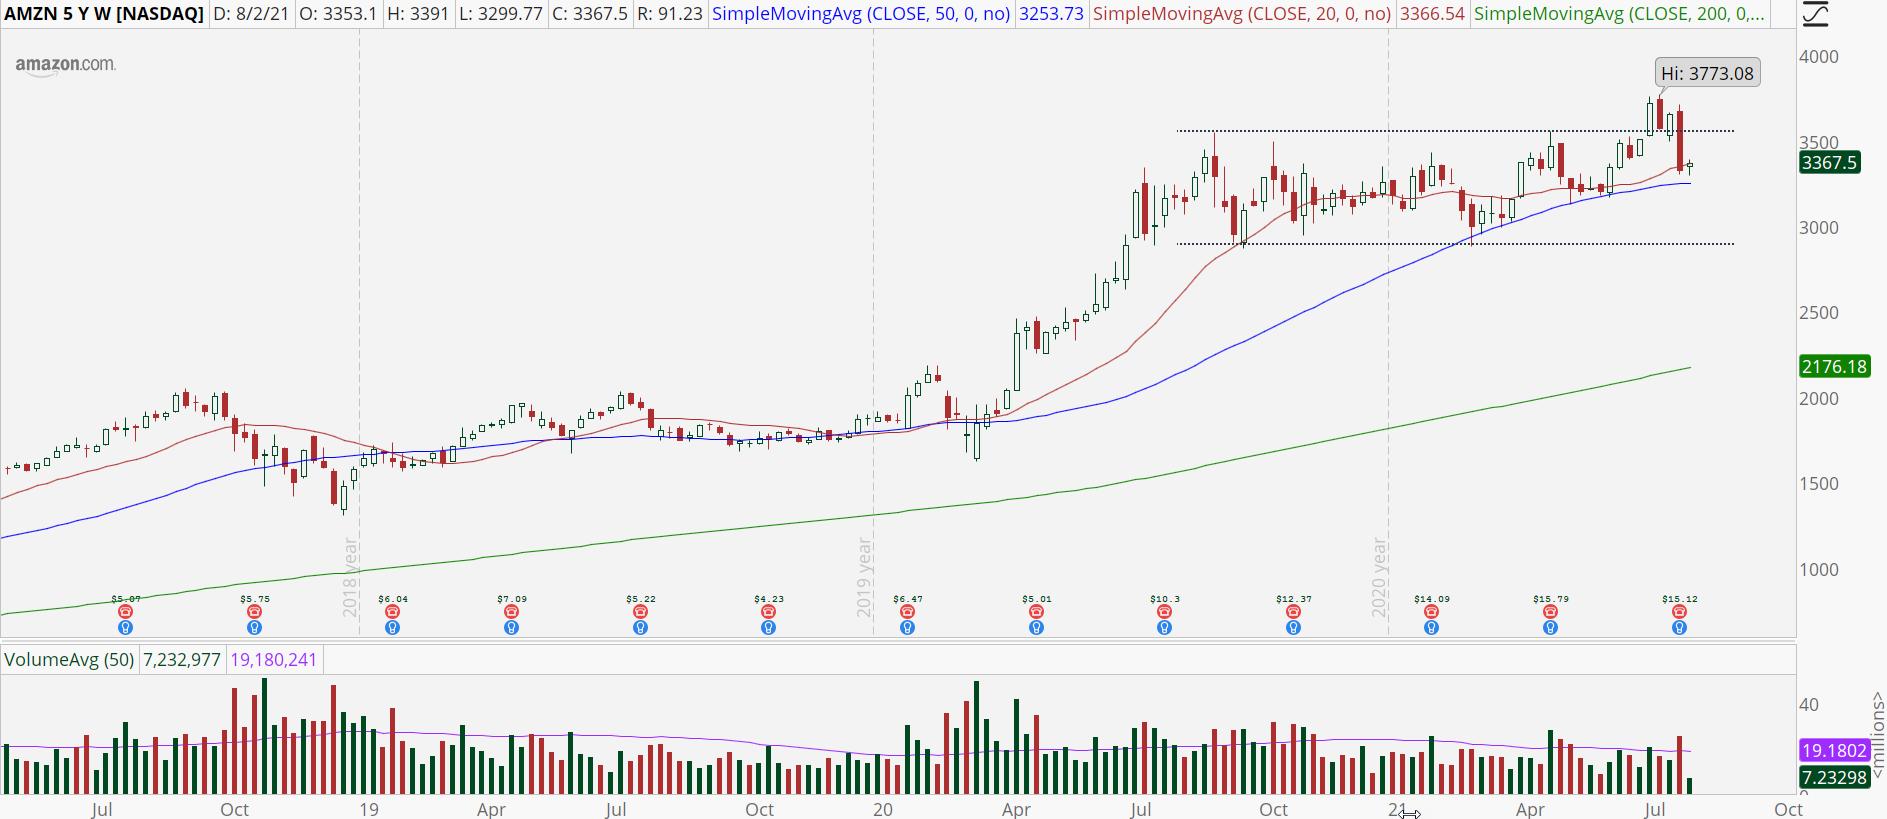 Amazon (AMZN) weekly stock chart with bull trap